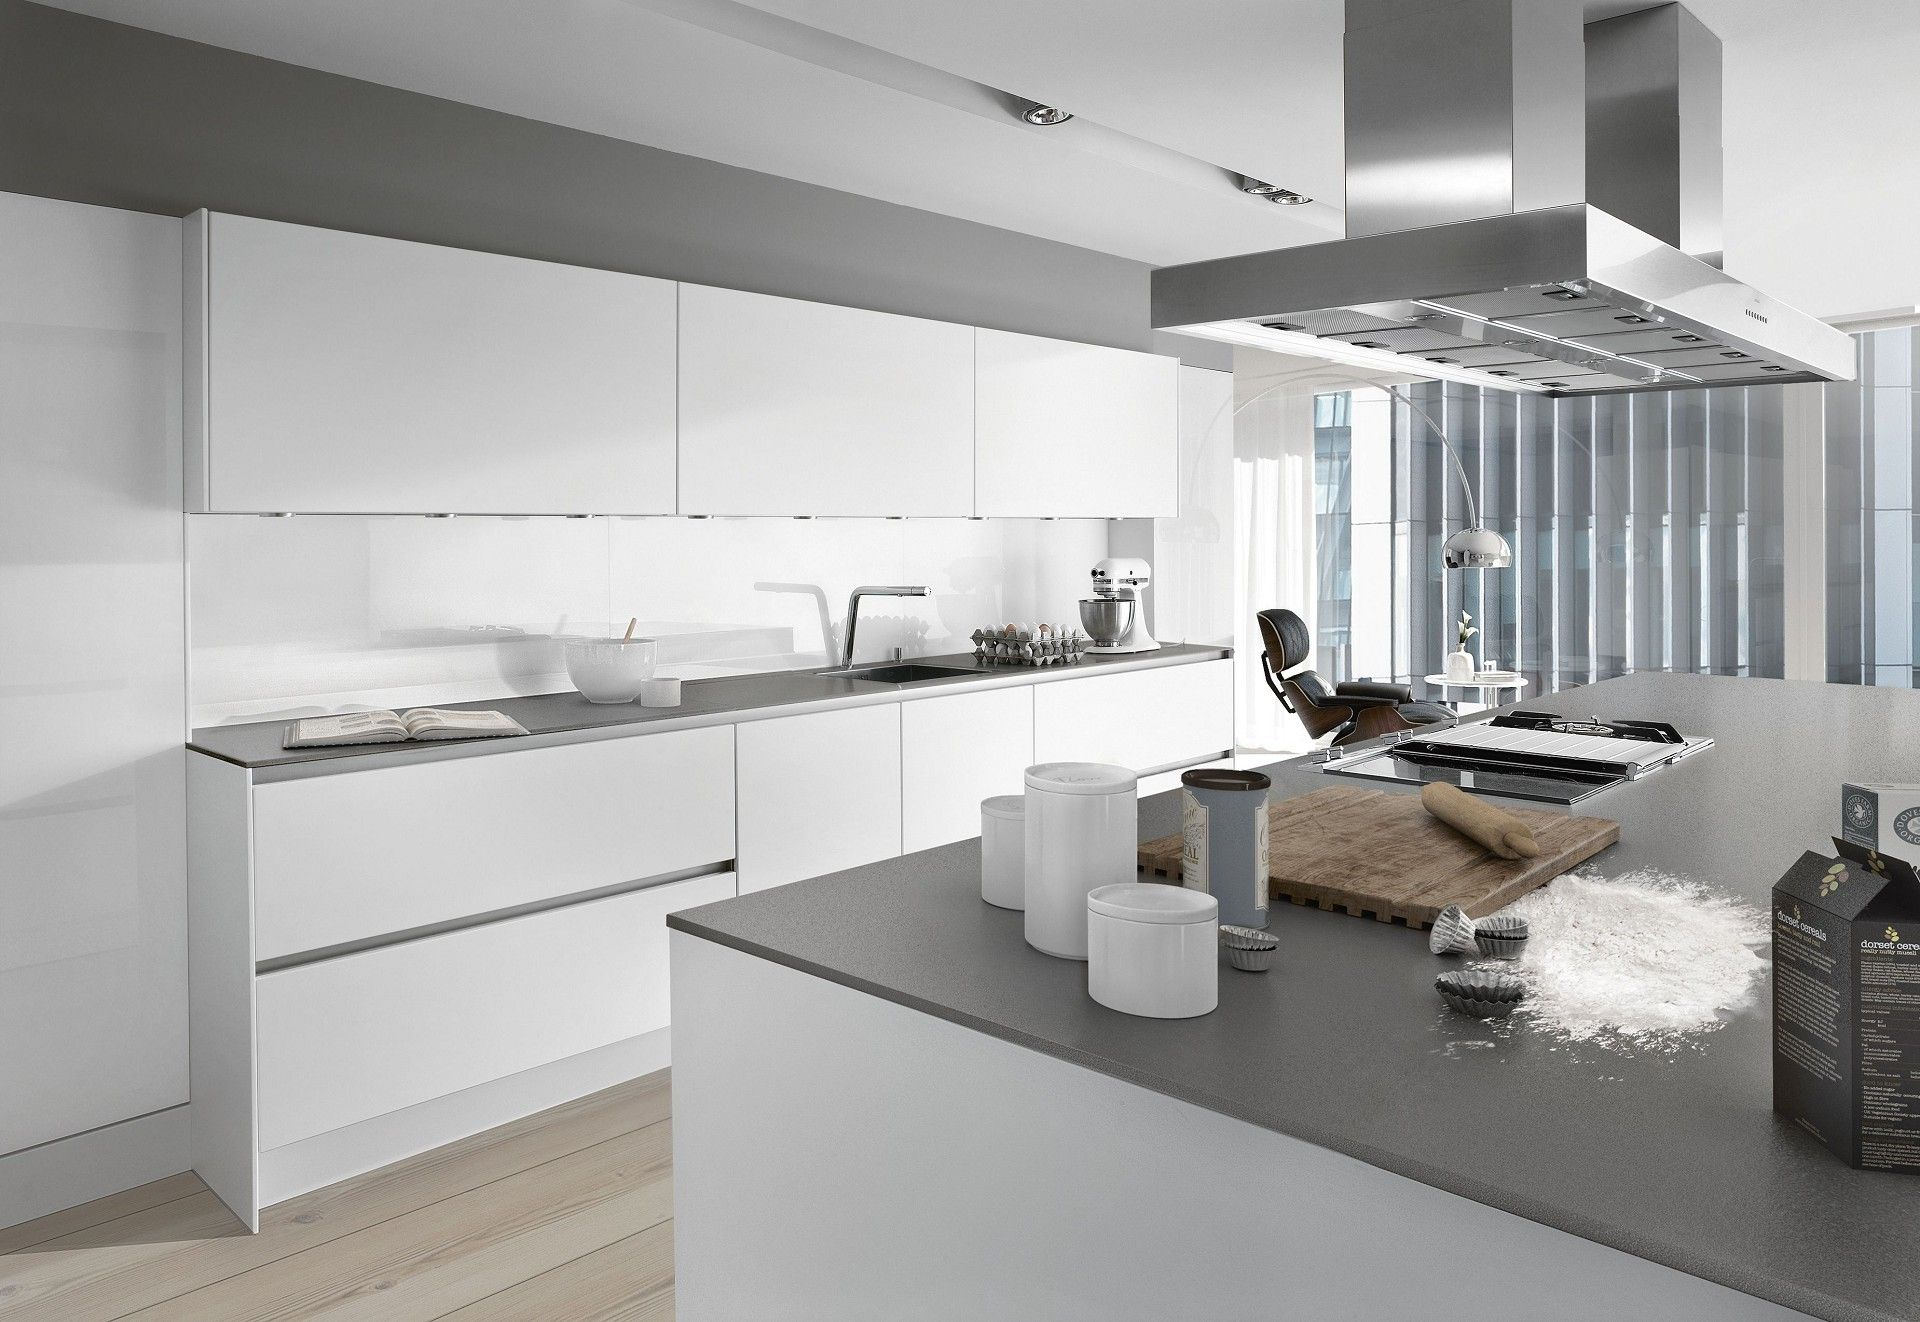 k chenm bel aus polen mit preise ostseesuche com. Black Bedroom Furniture Sets. Home Design Ideas